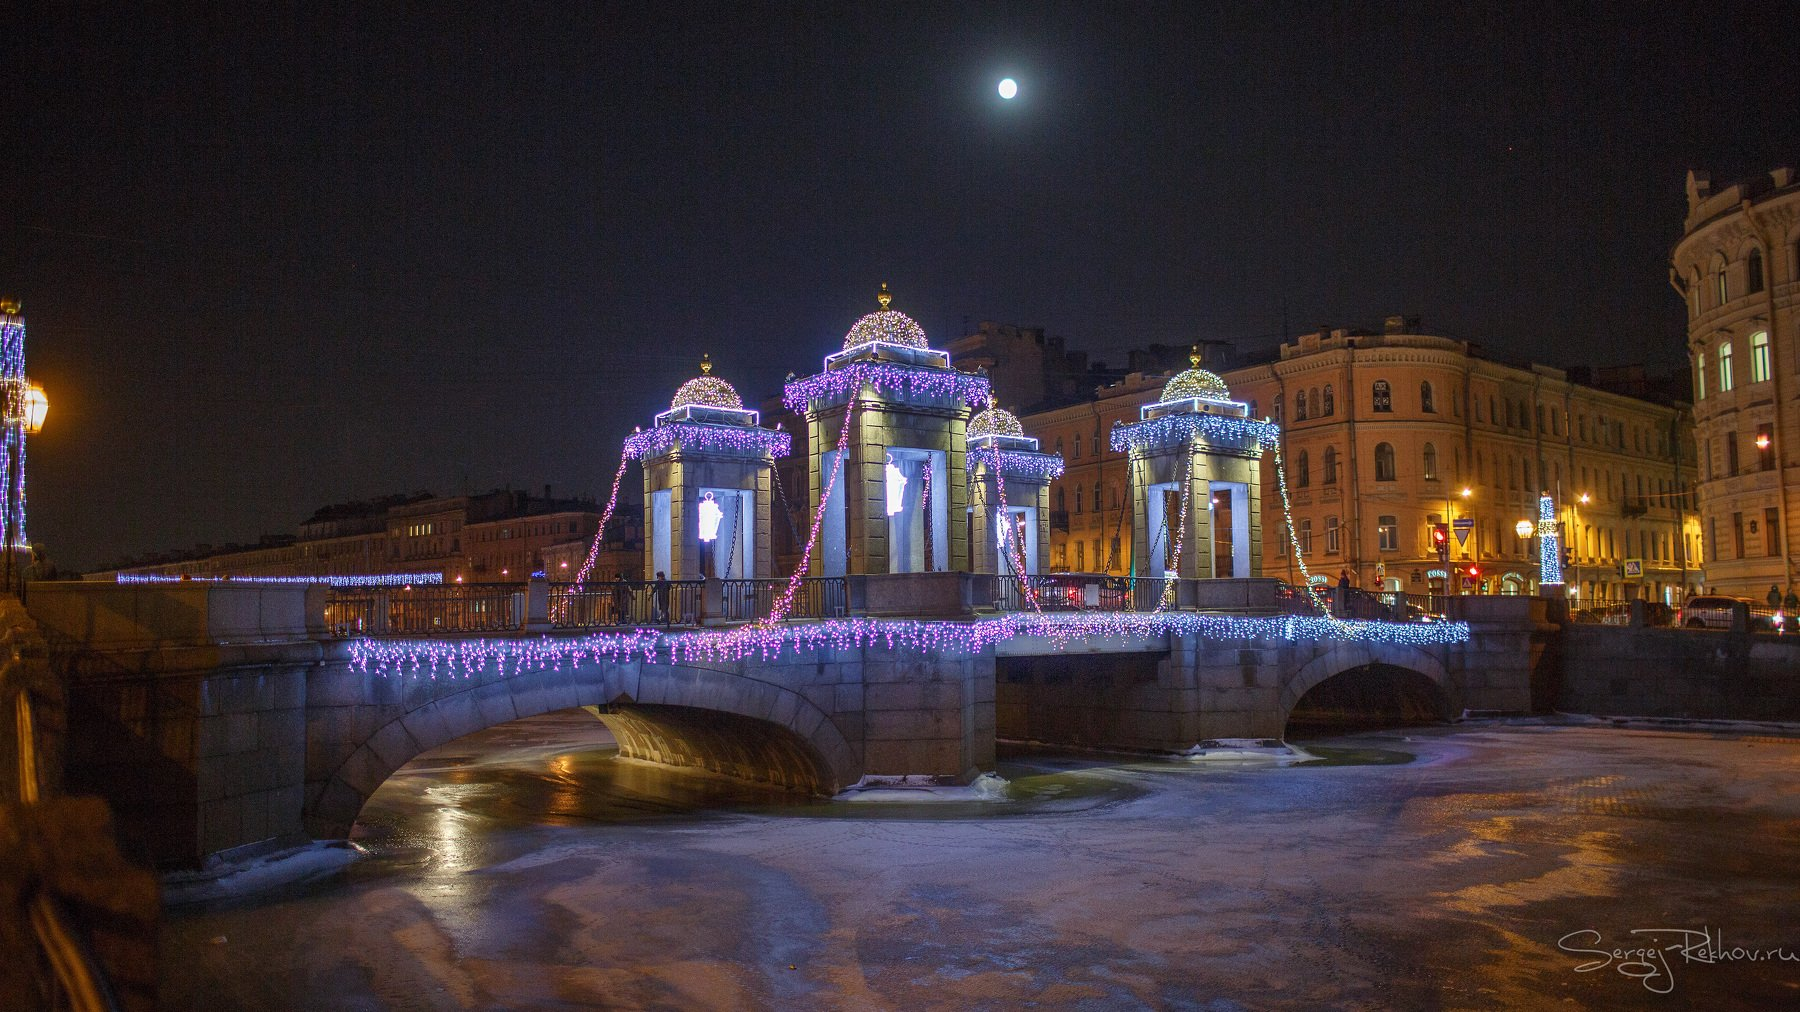 питер, санкт-петербург, ночь, зима, мороз, рехов, сергейрехов, Сергей Рехов